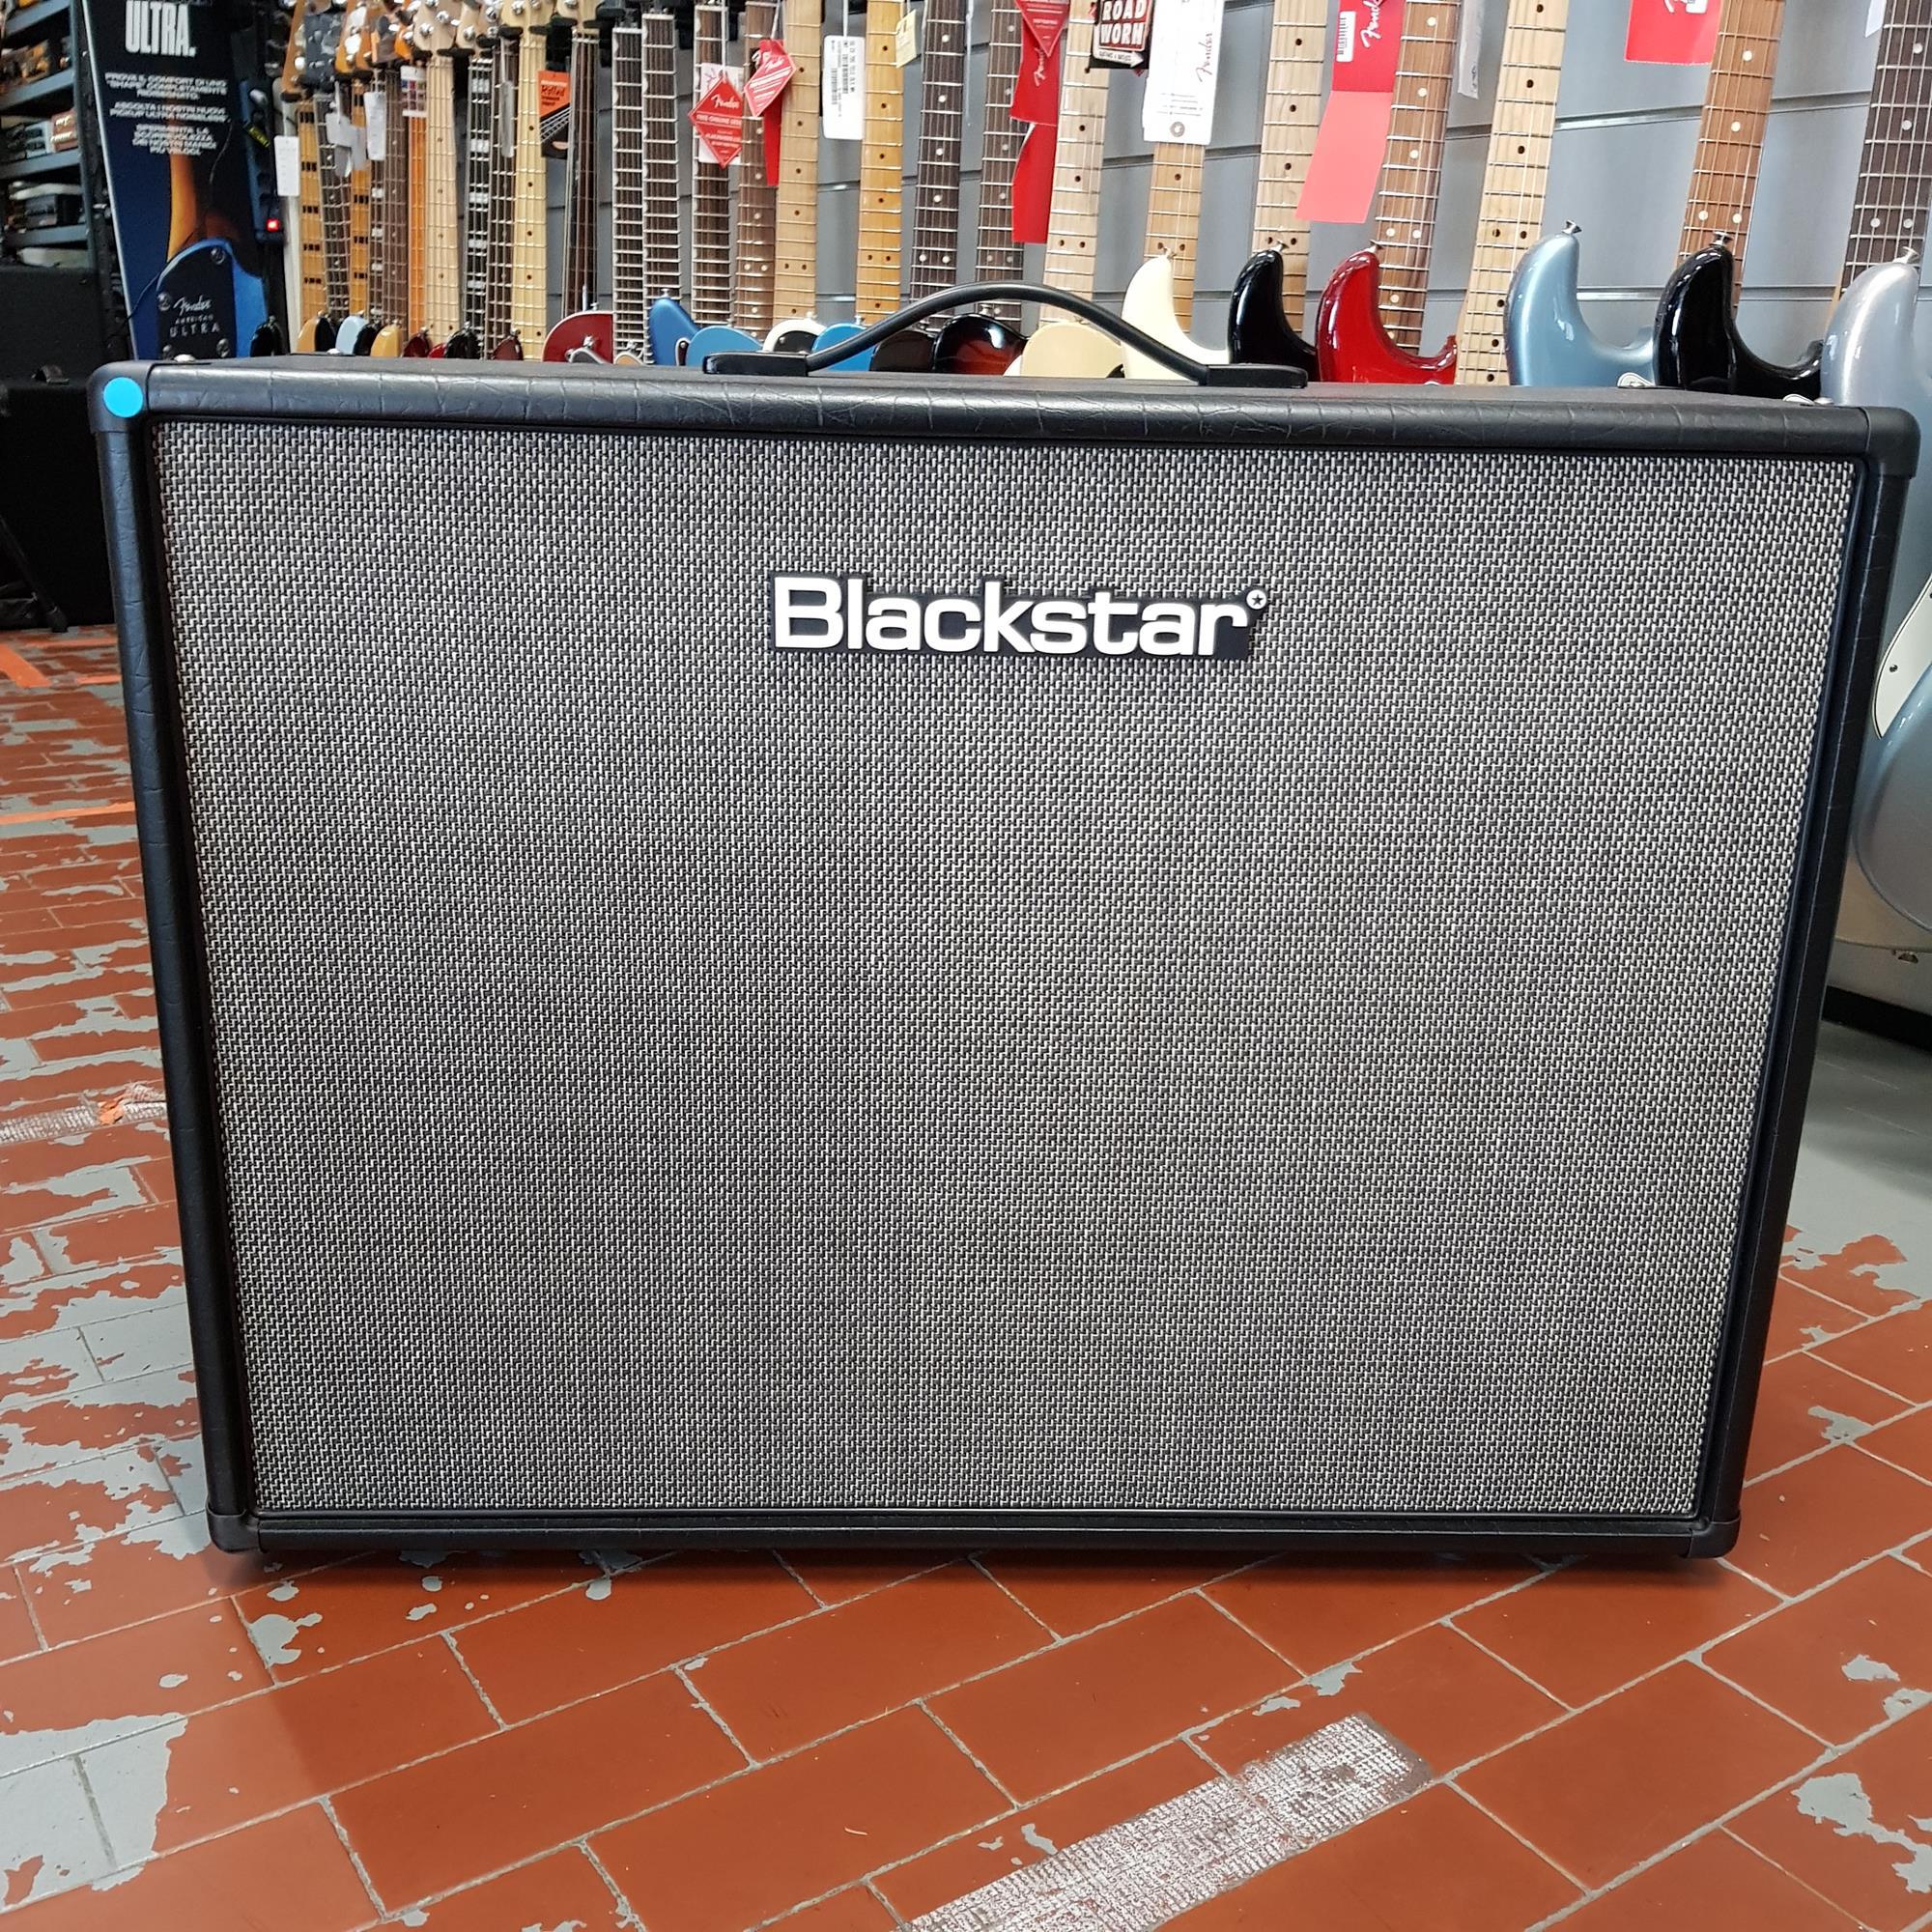 BLACKSTAR-HTV212-CAB-212-sku-1628349624556